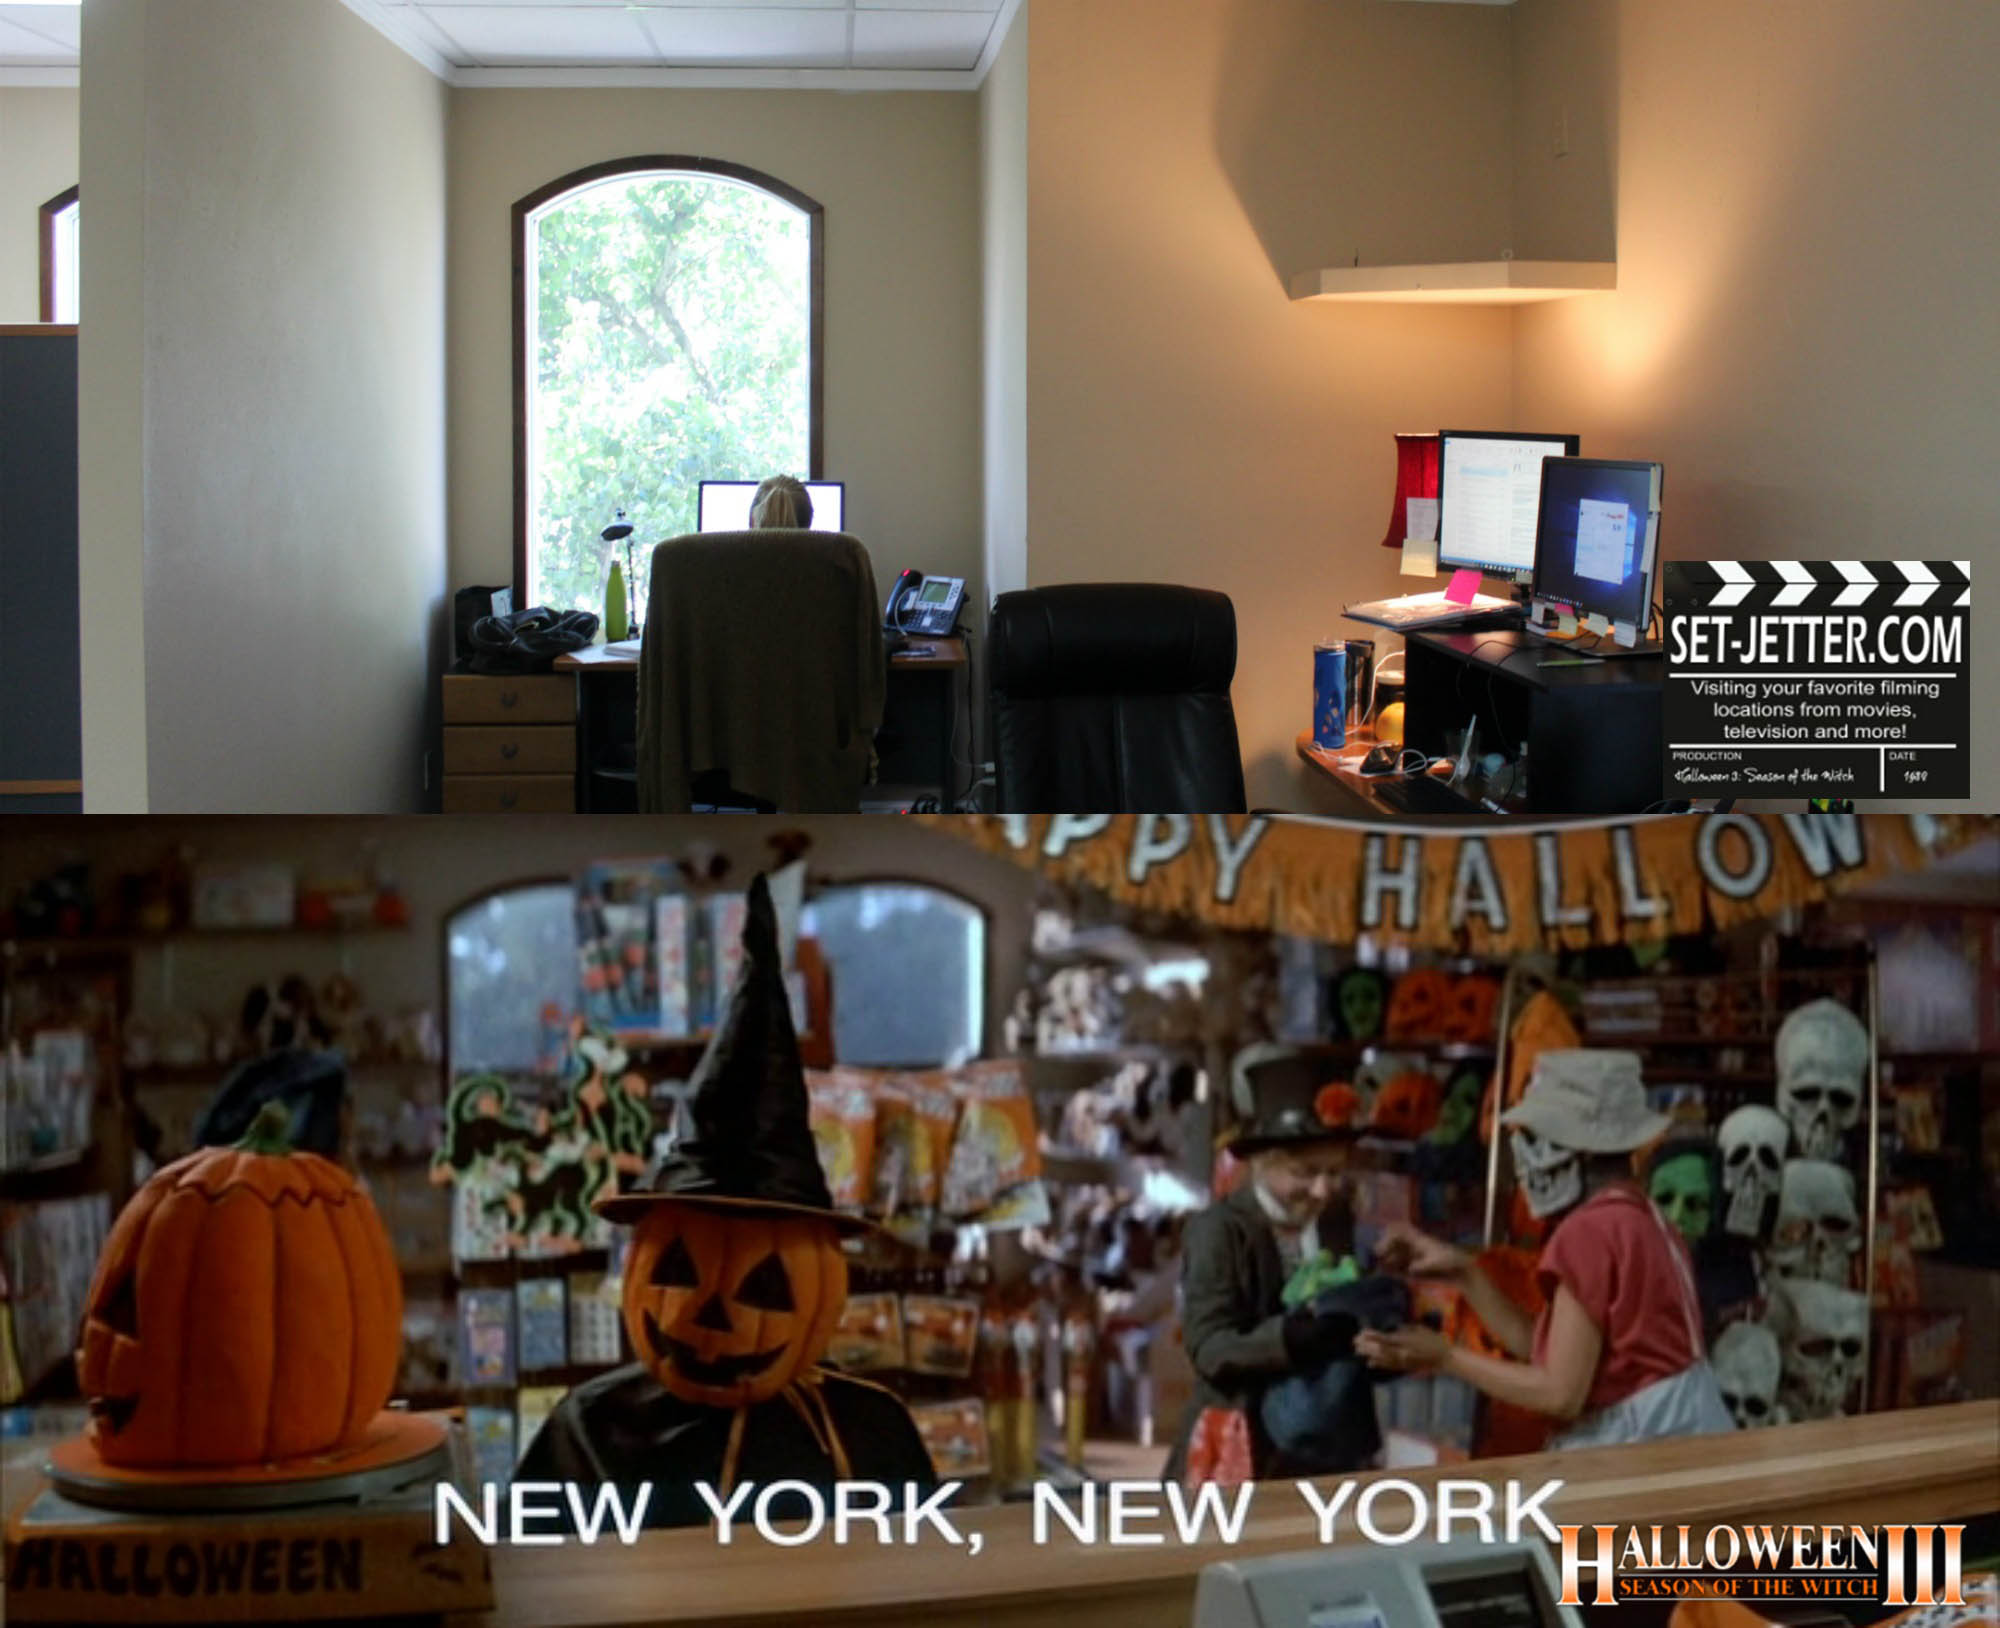 HalloweenIII-NY-03.jpg